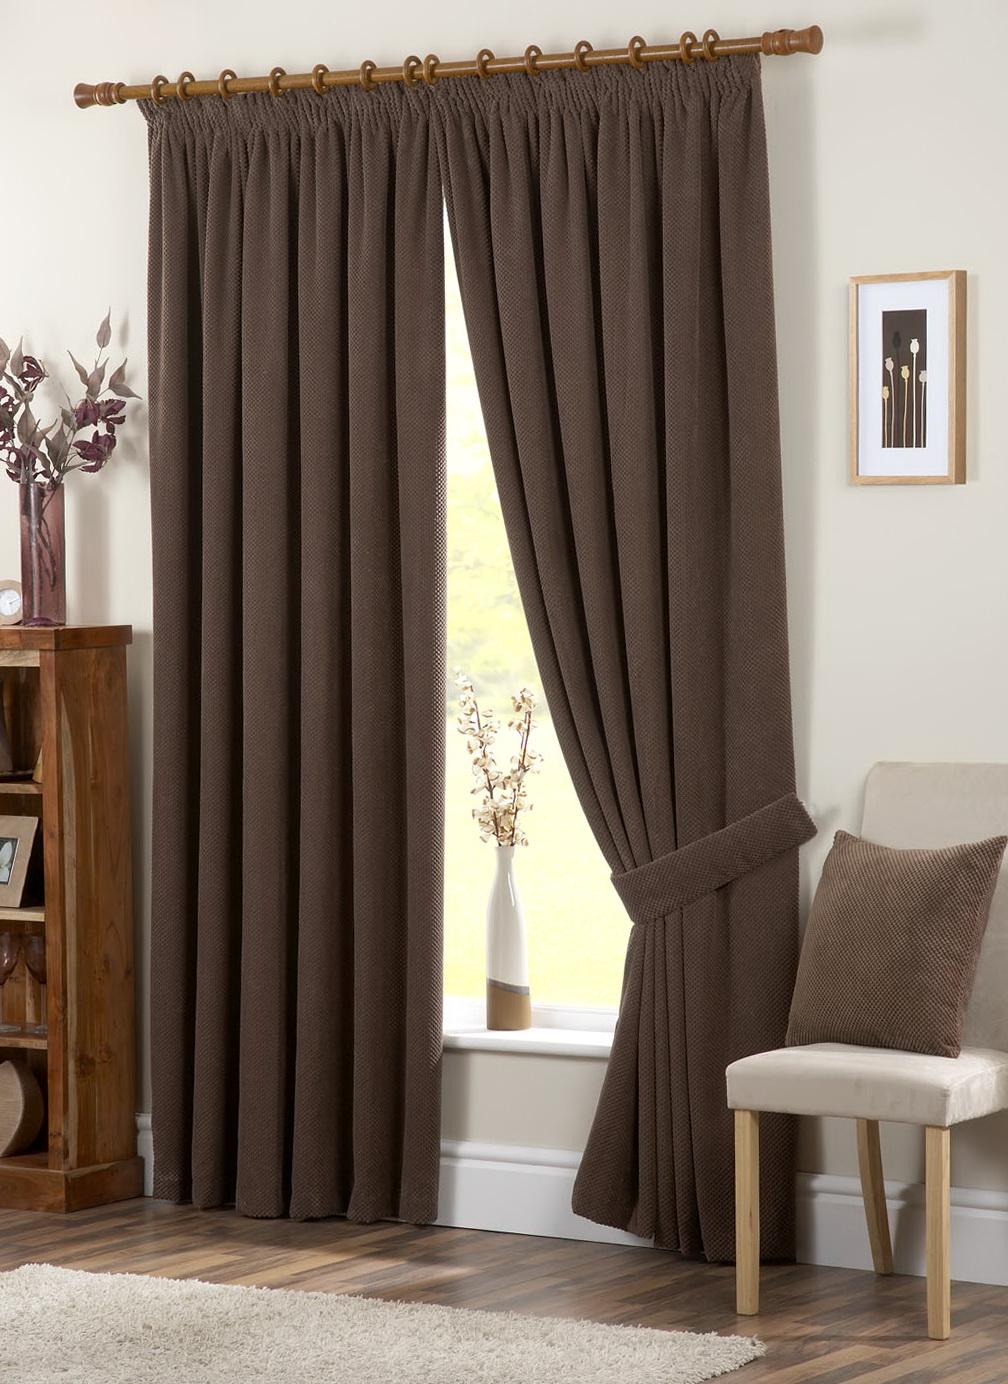 Chocolate Brown Eyelet Curtains